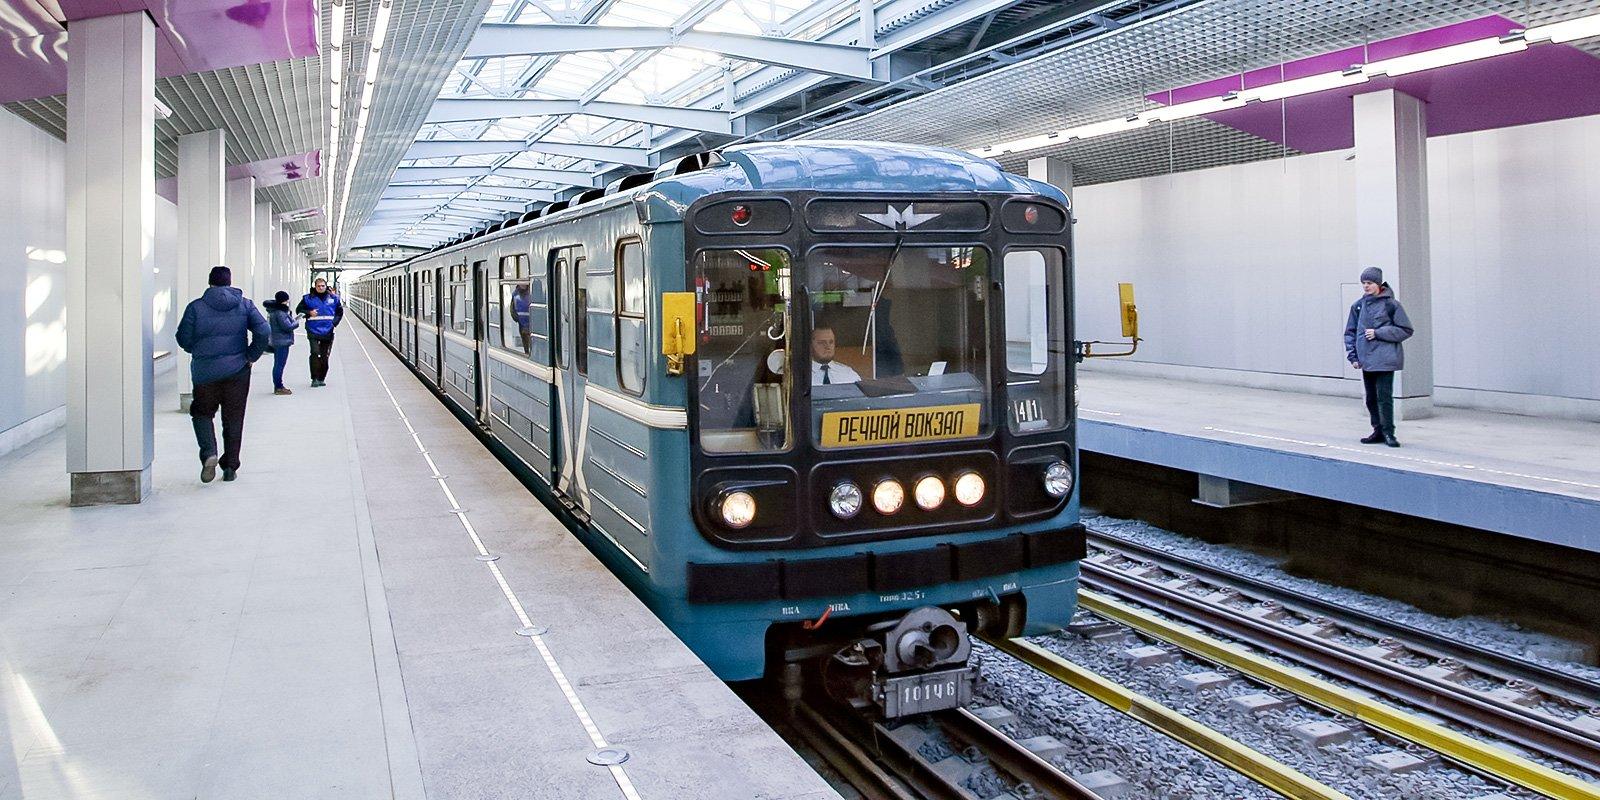 Type 81-717/714 train